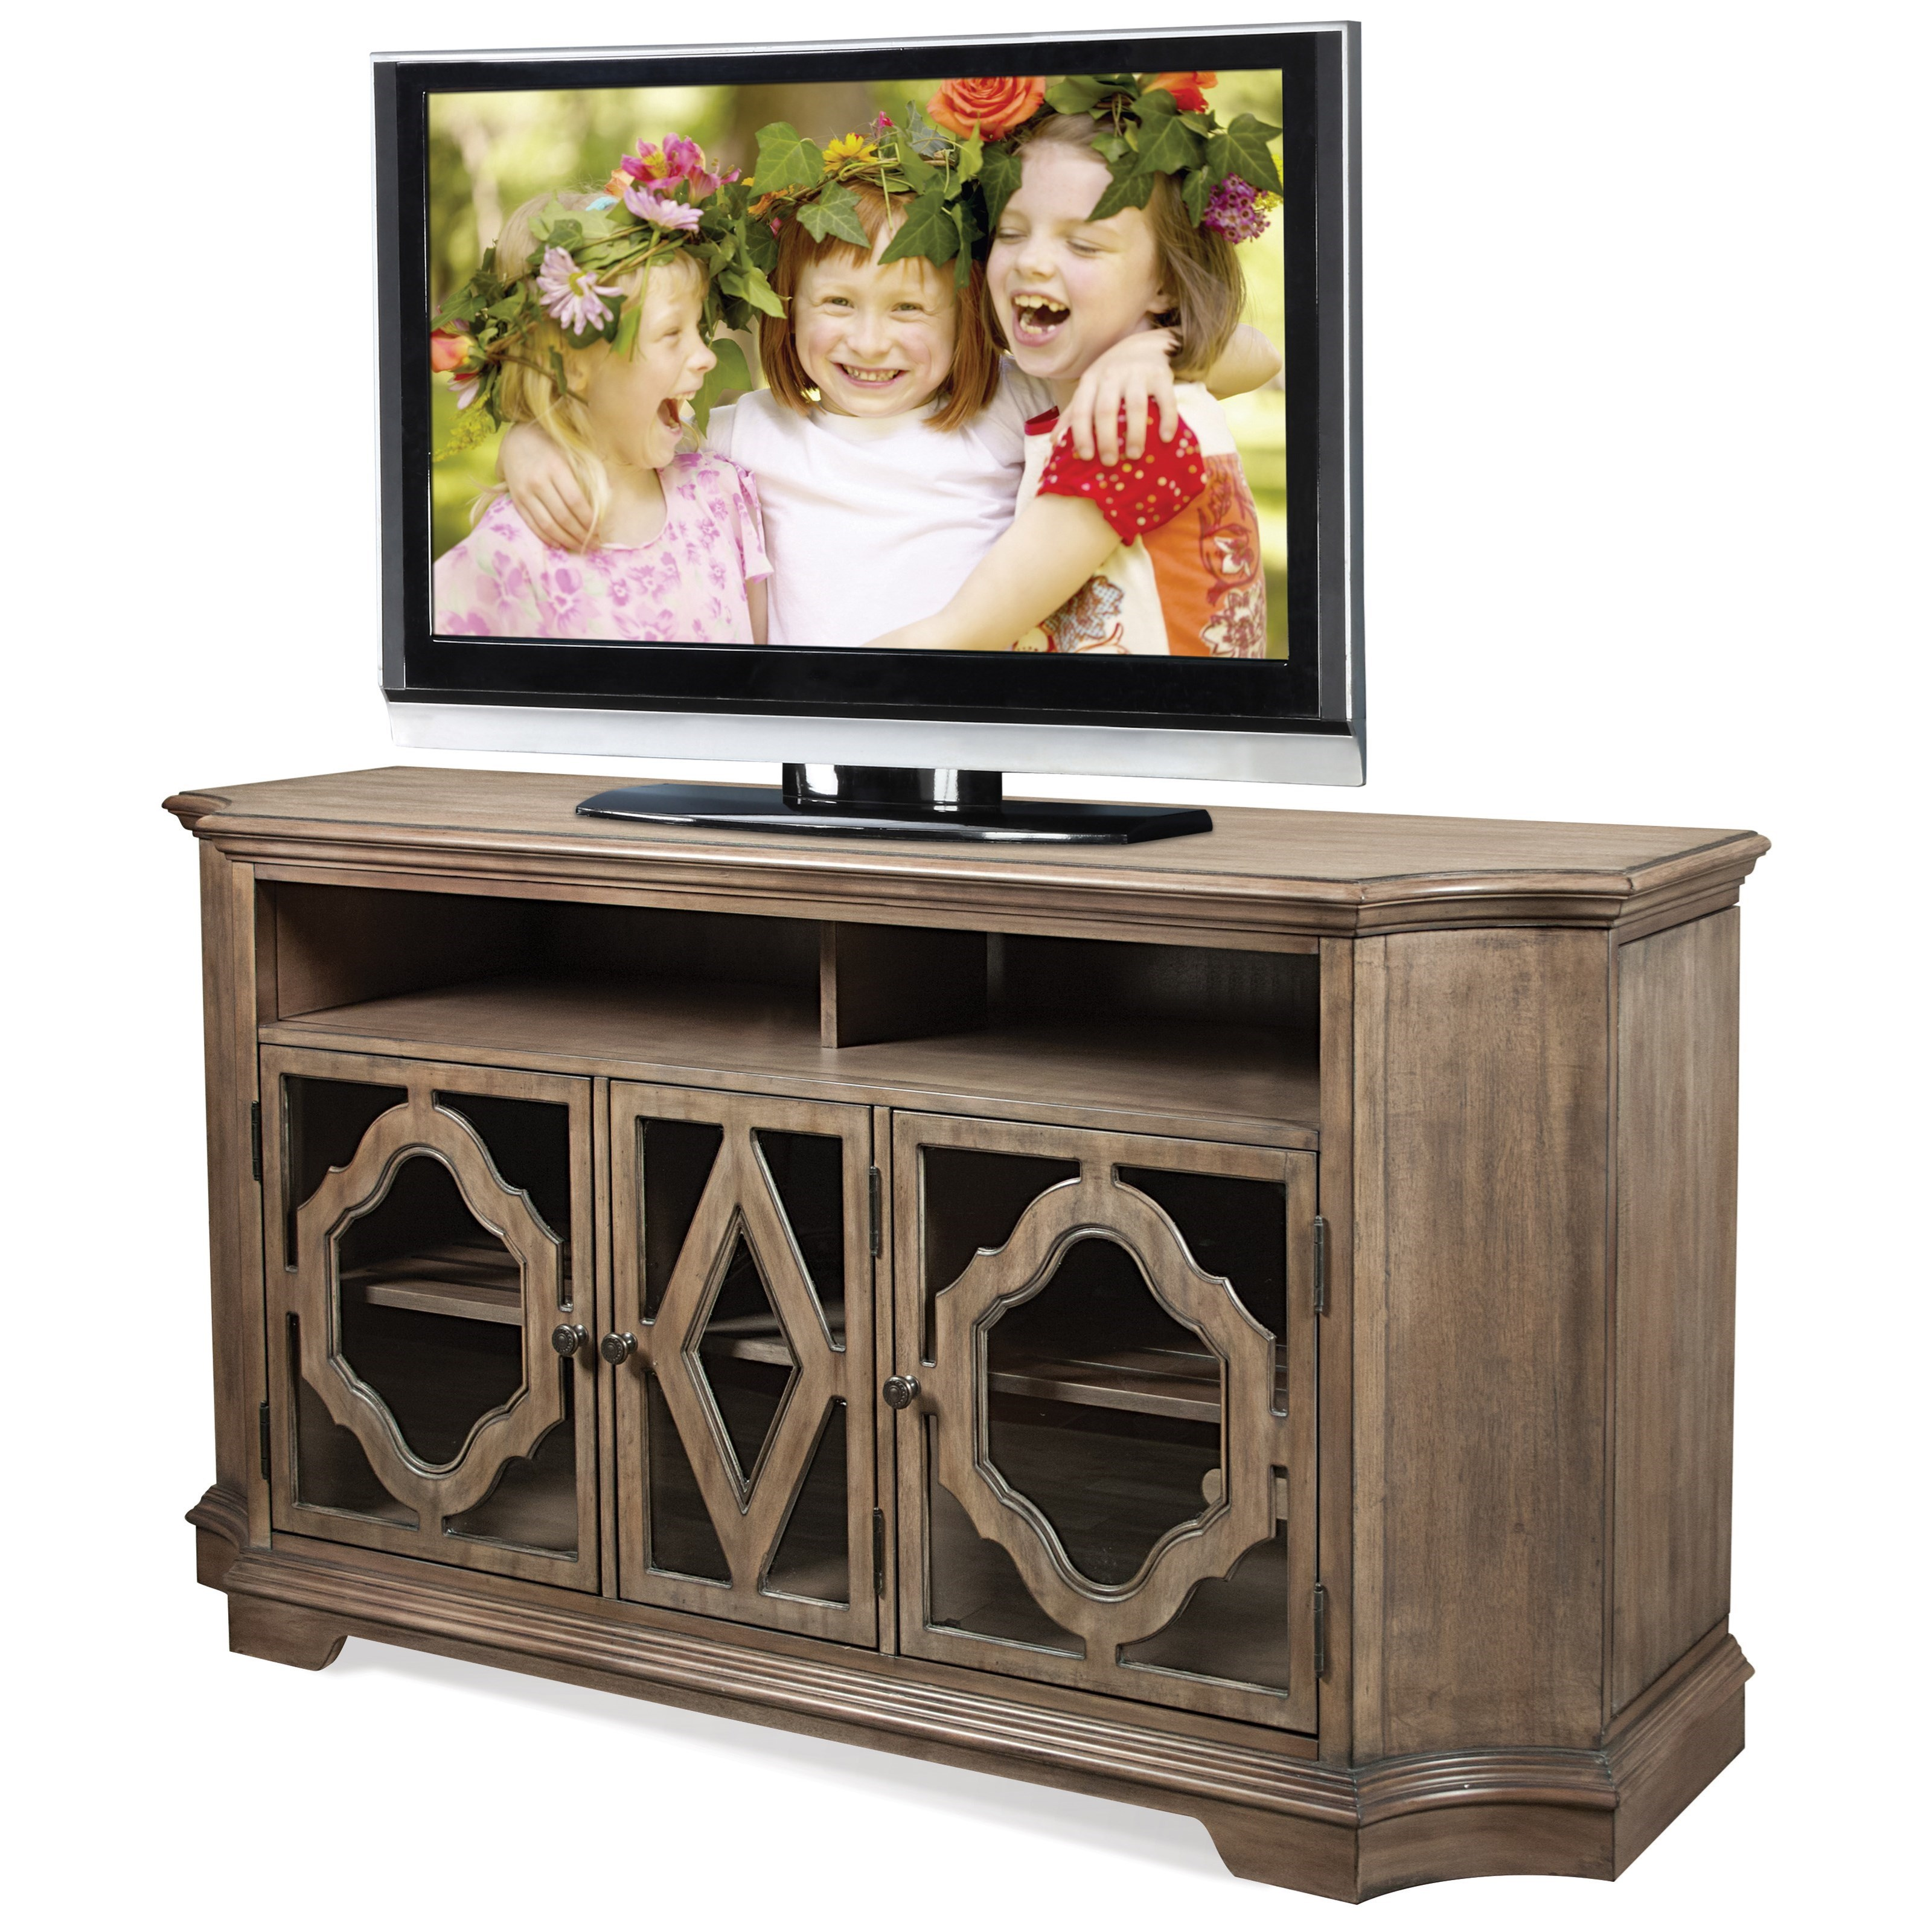 Riverside Furniture Corinne TV Console - Item Number: 21540